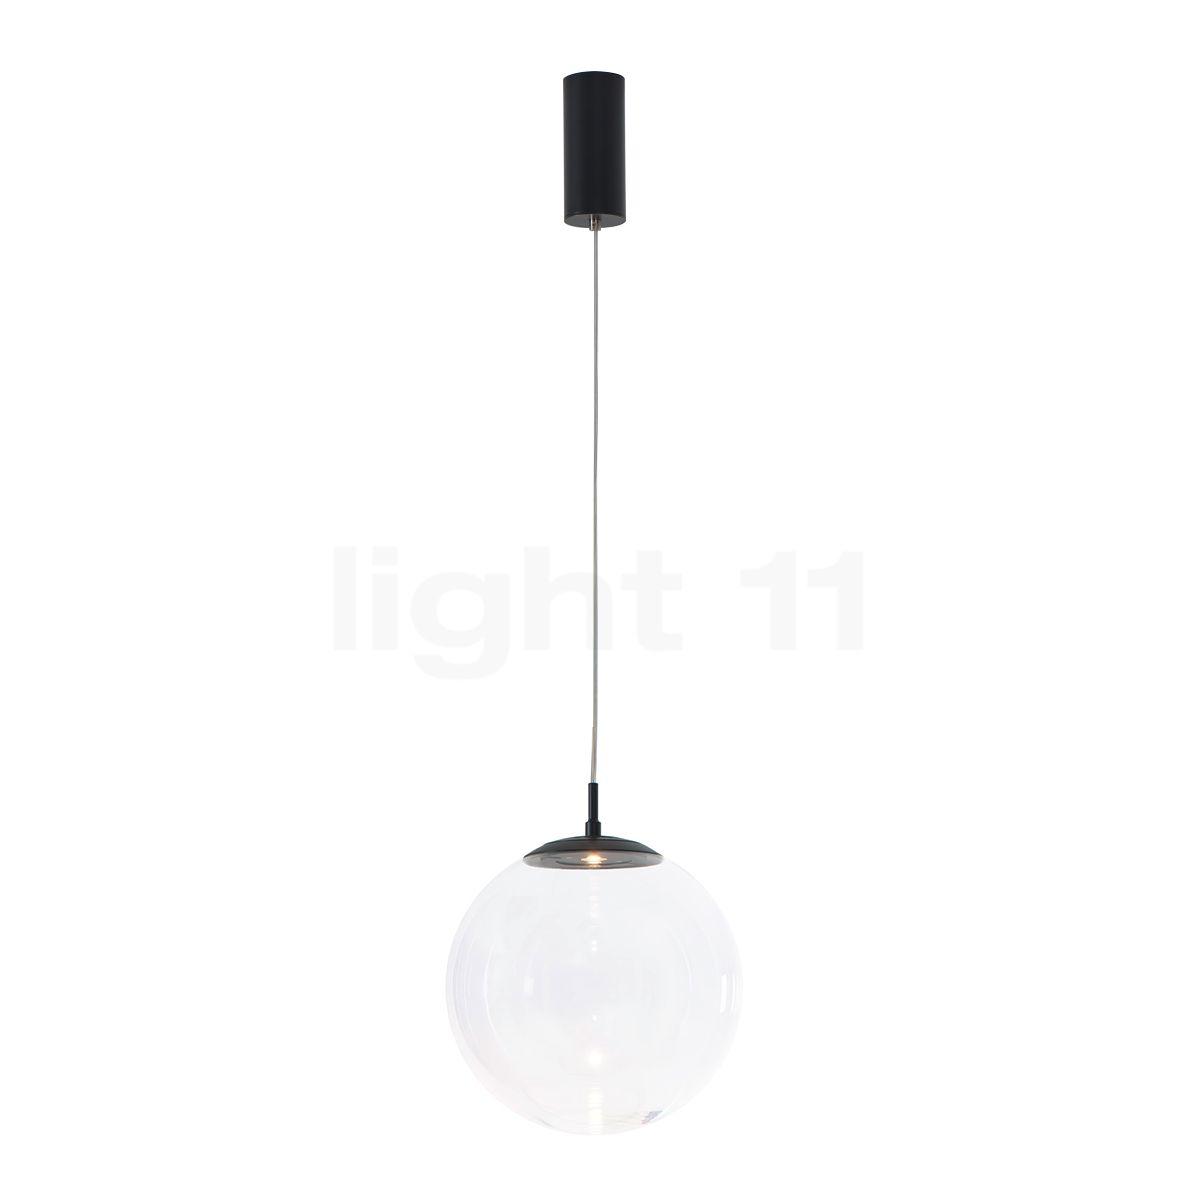 Mawa Glaskugelleuchte LED, Kristallglas/schwarz matt ku3-7-3000-gc-9005